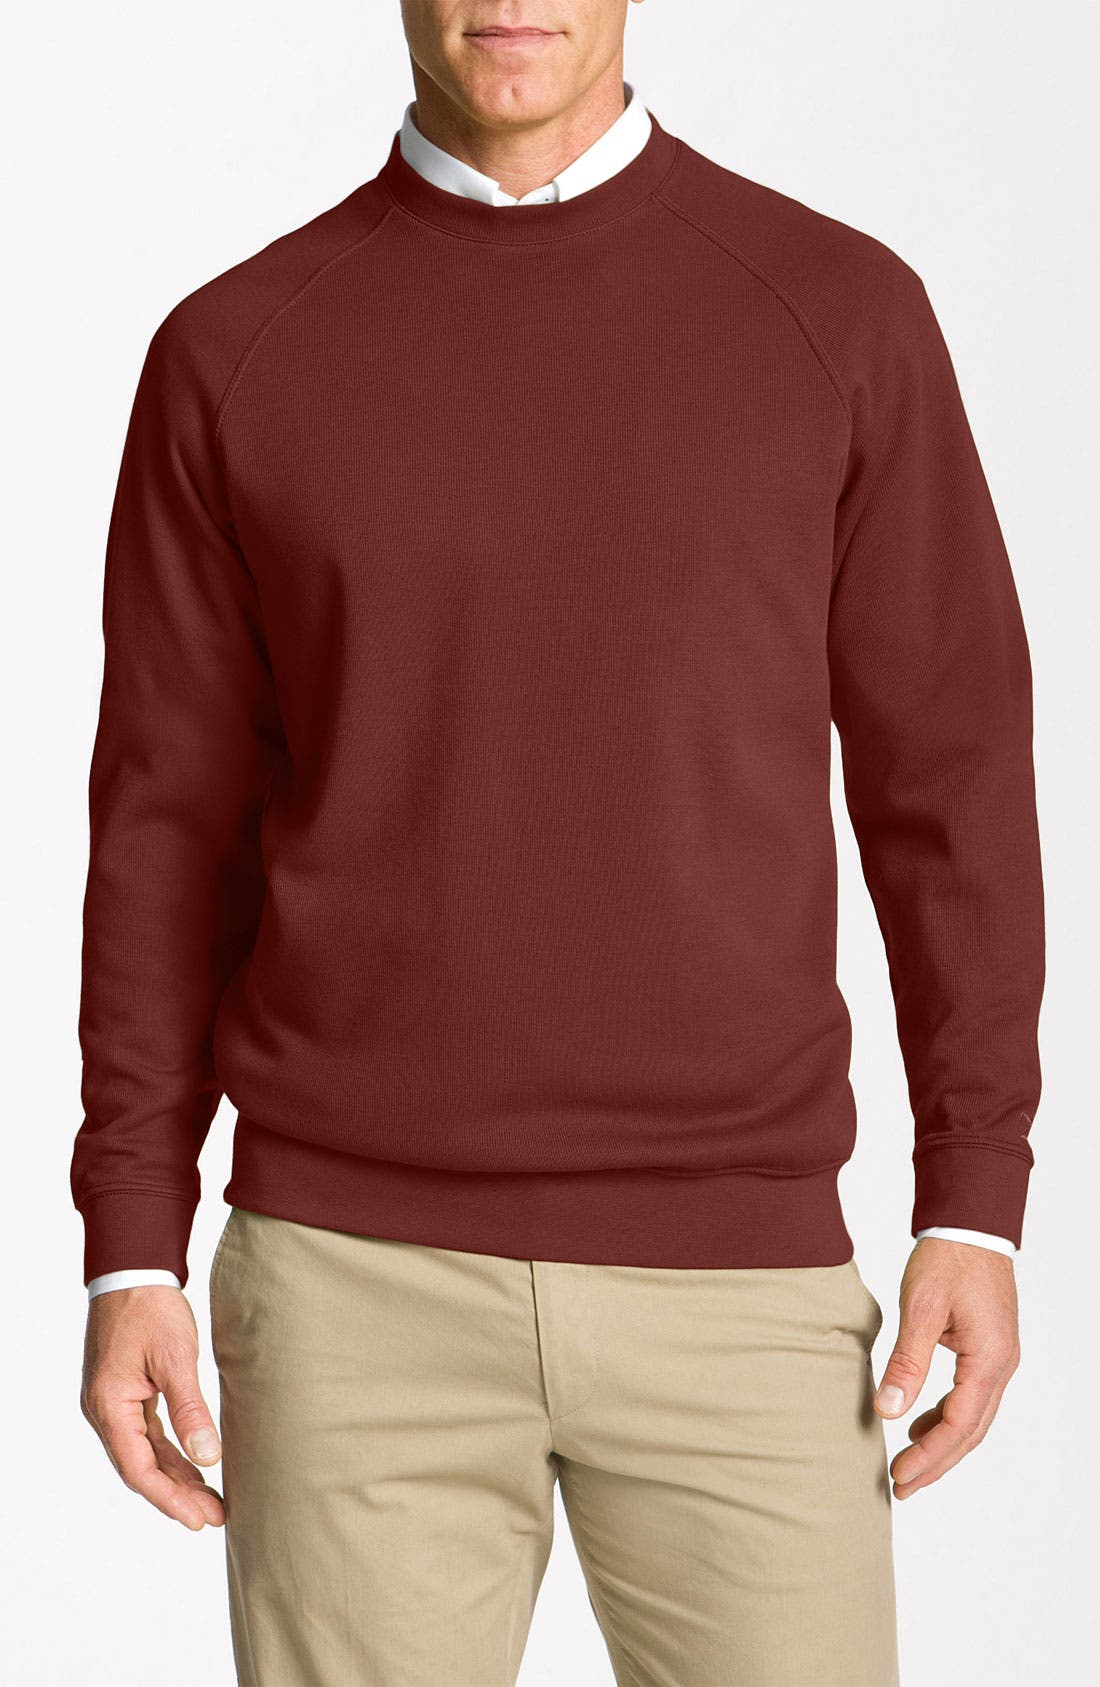 Main Image - Cutter & Buck 'Canoe Ridge' Crewneck Sweater (Big & Tall) (Online Exclusive)